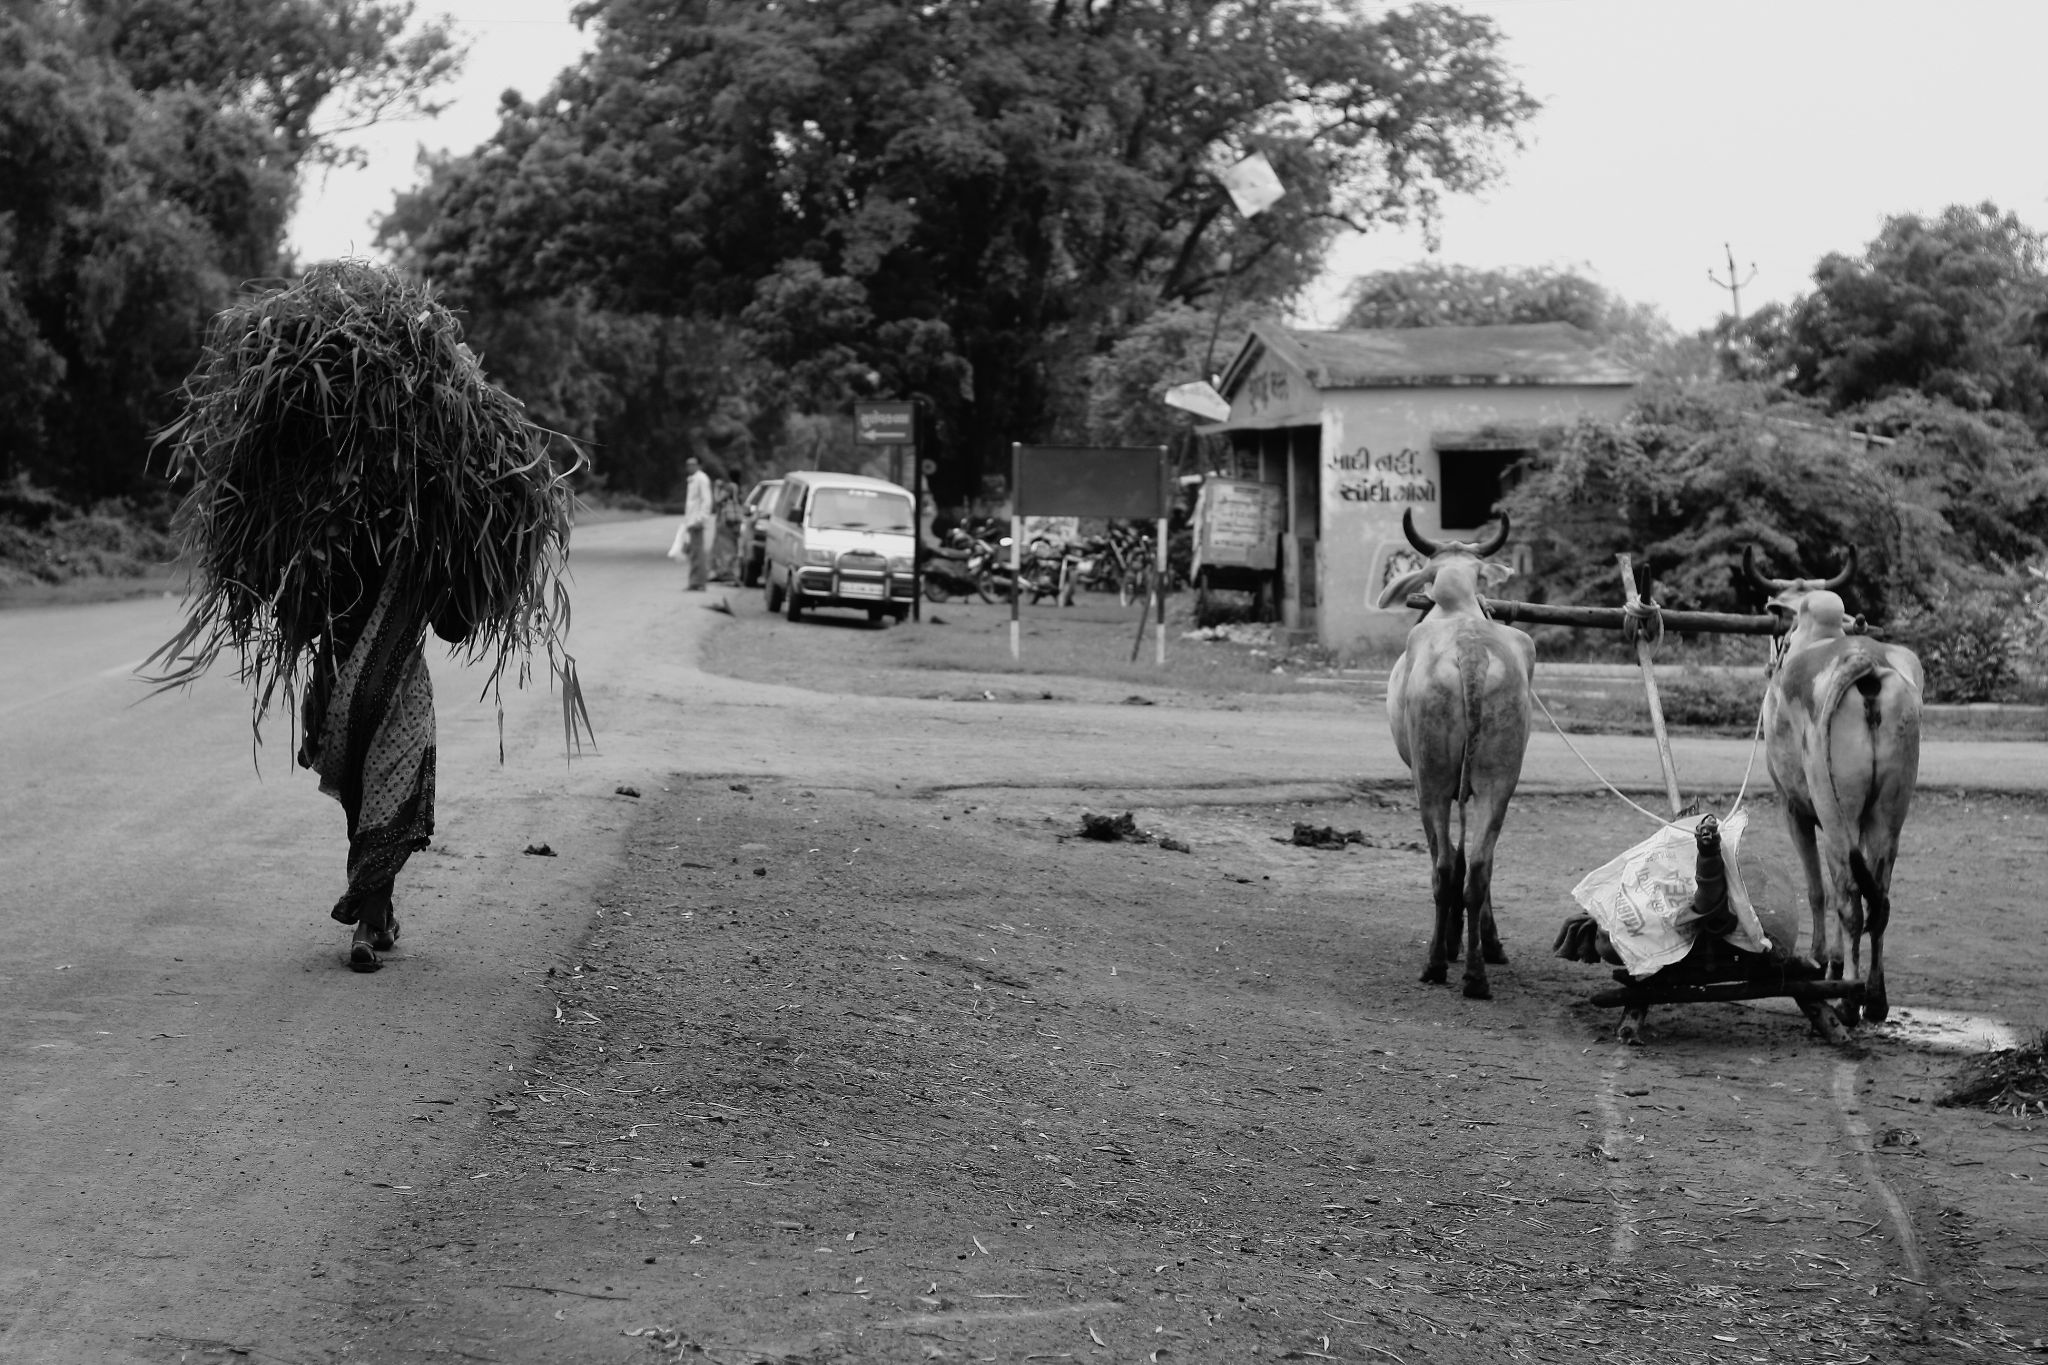 on the road by AyyaluRKumaran